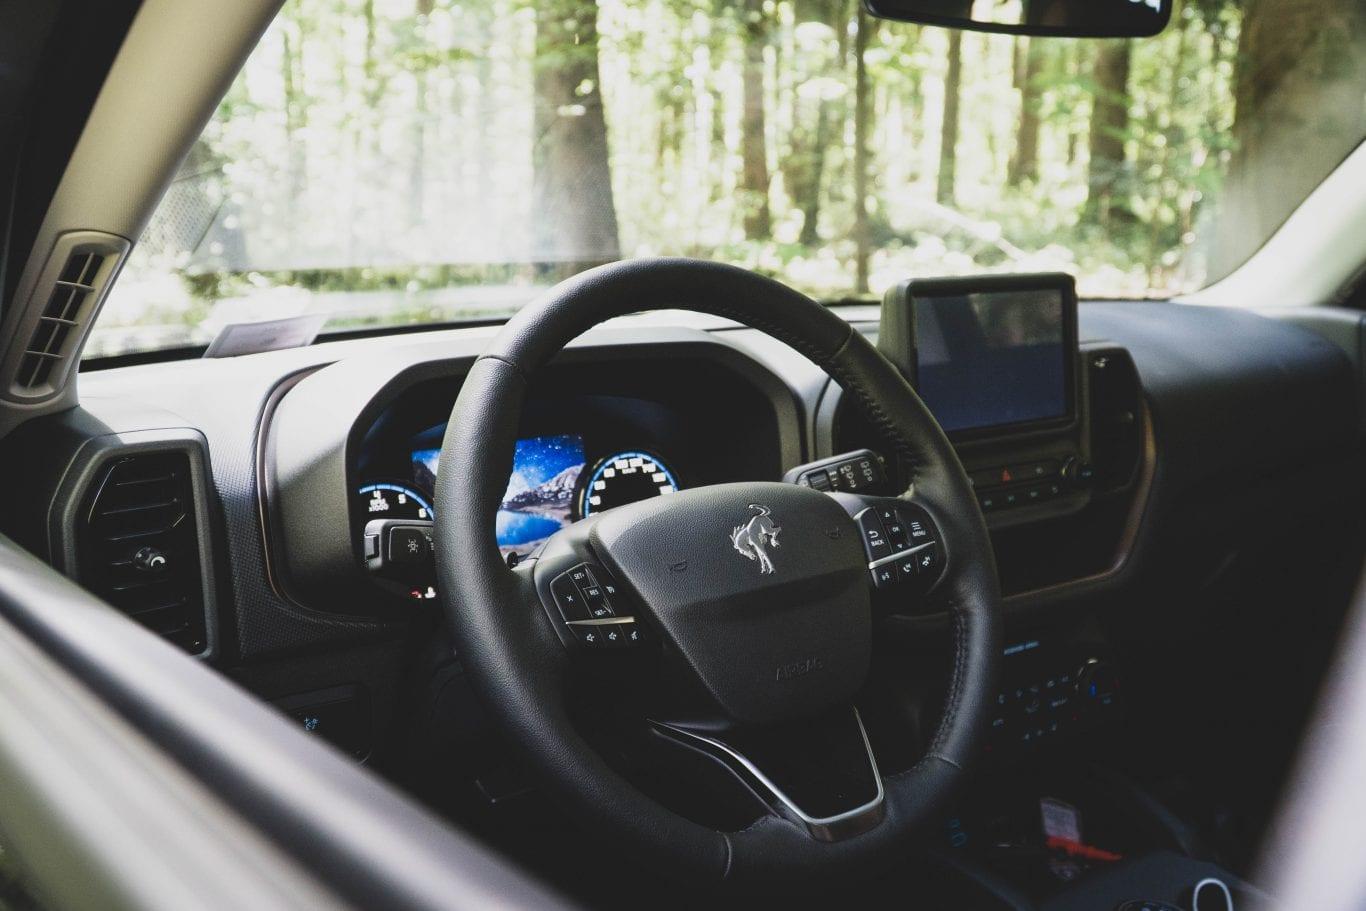 Zusatzrabatt Frühlingsaktion bis 31.05.2021 - Auto Kunz AG 8